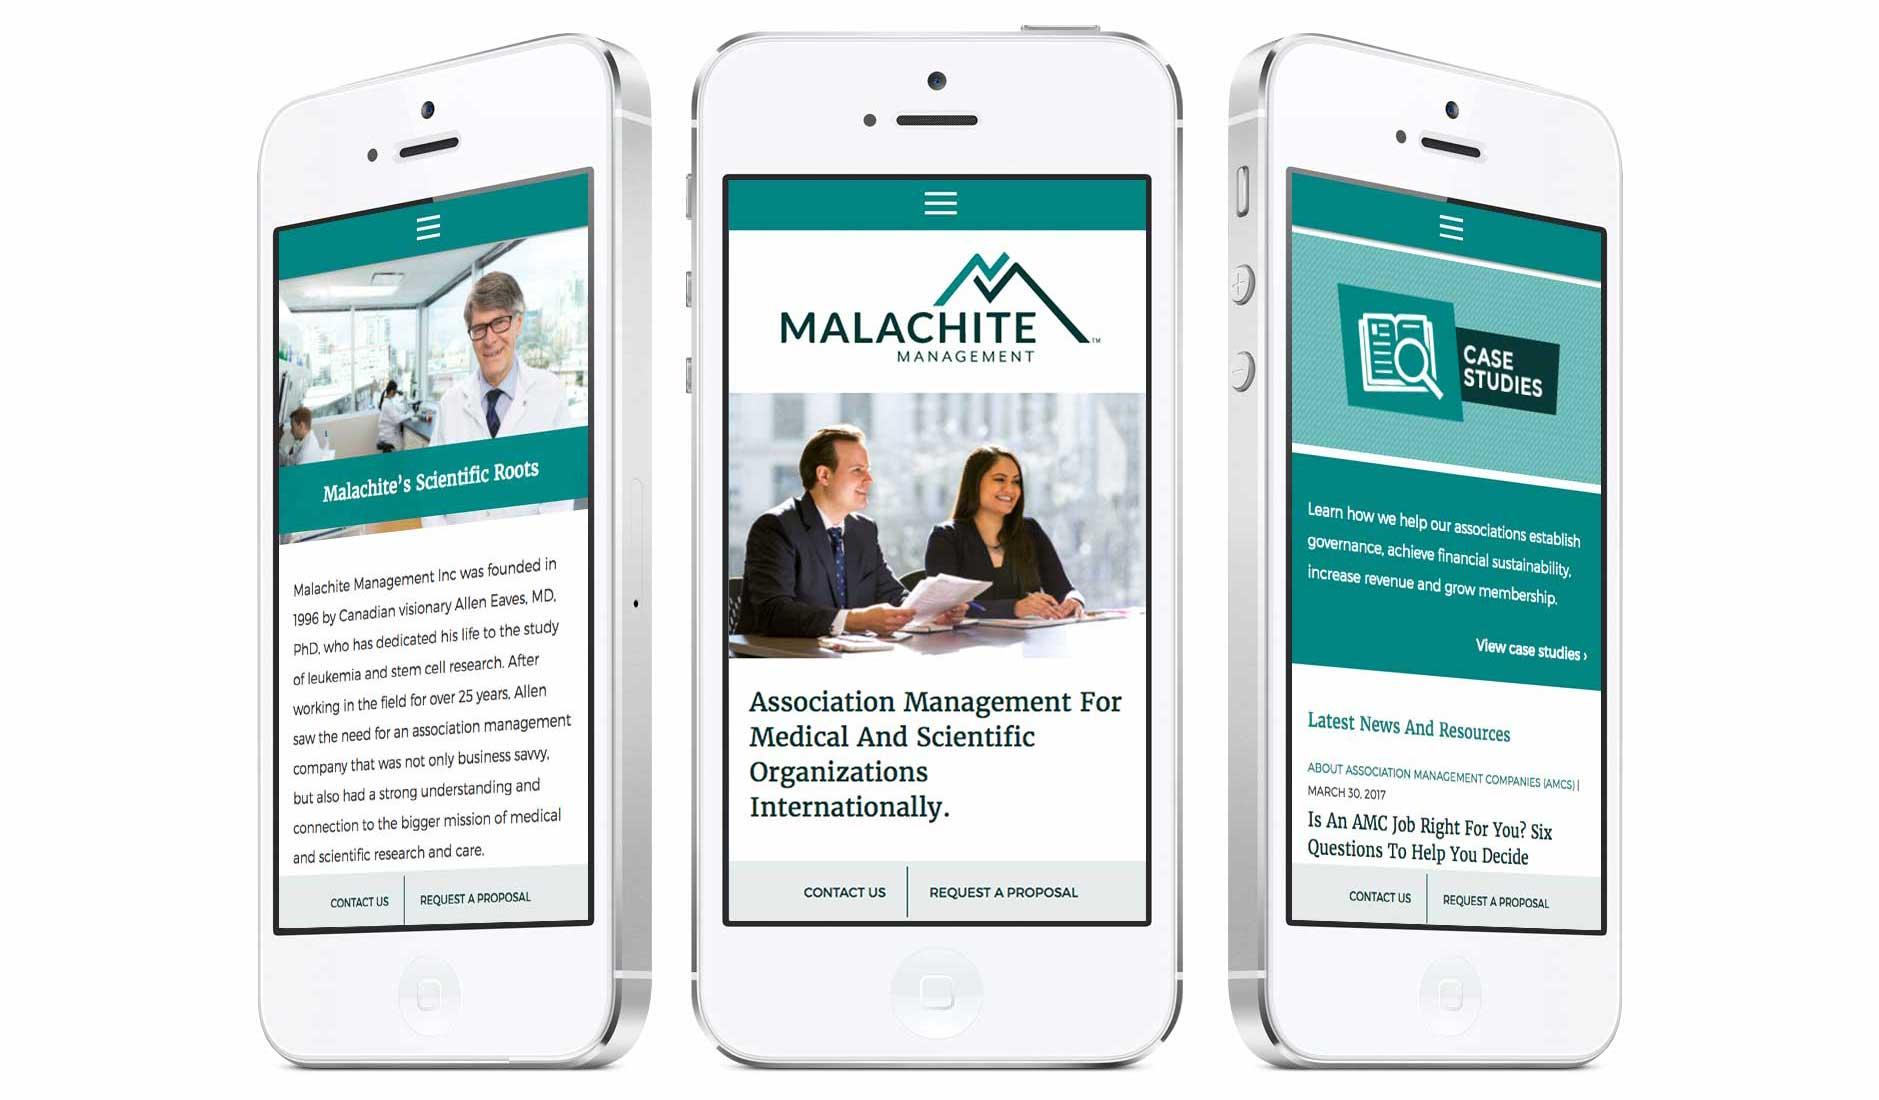 Malachite mobile web design by Cucumber Marketing Inc.